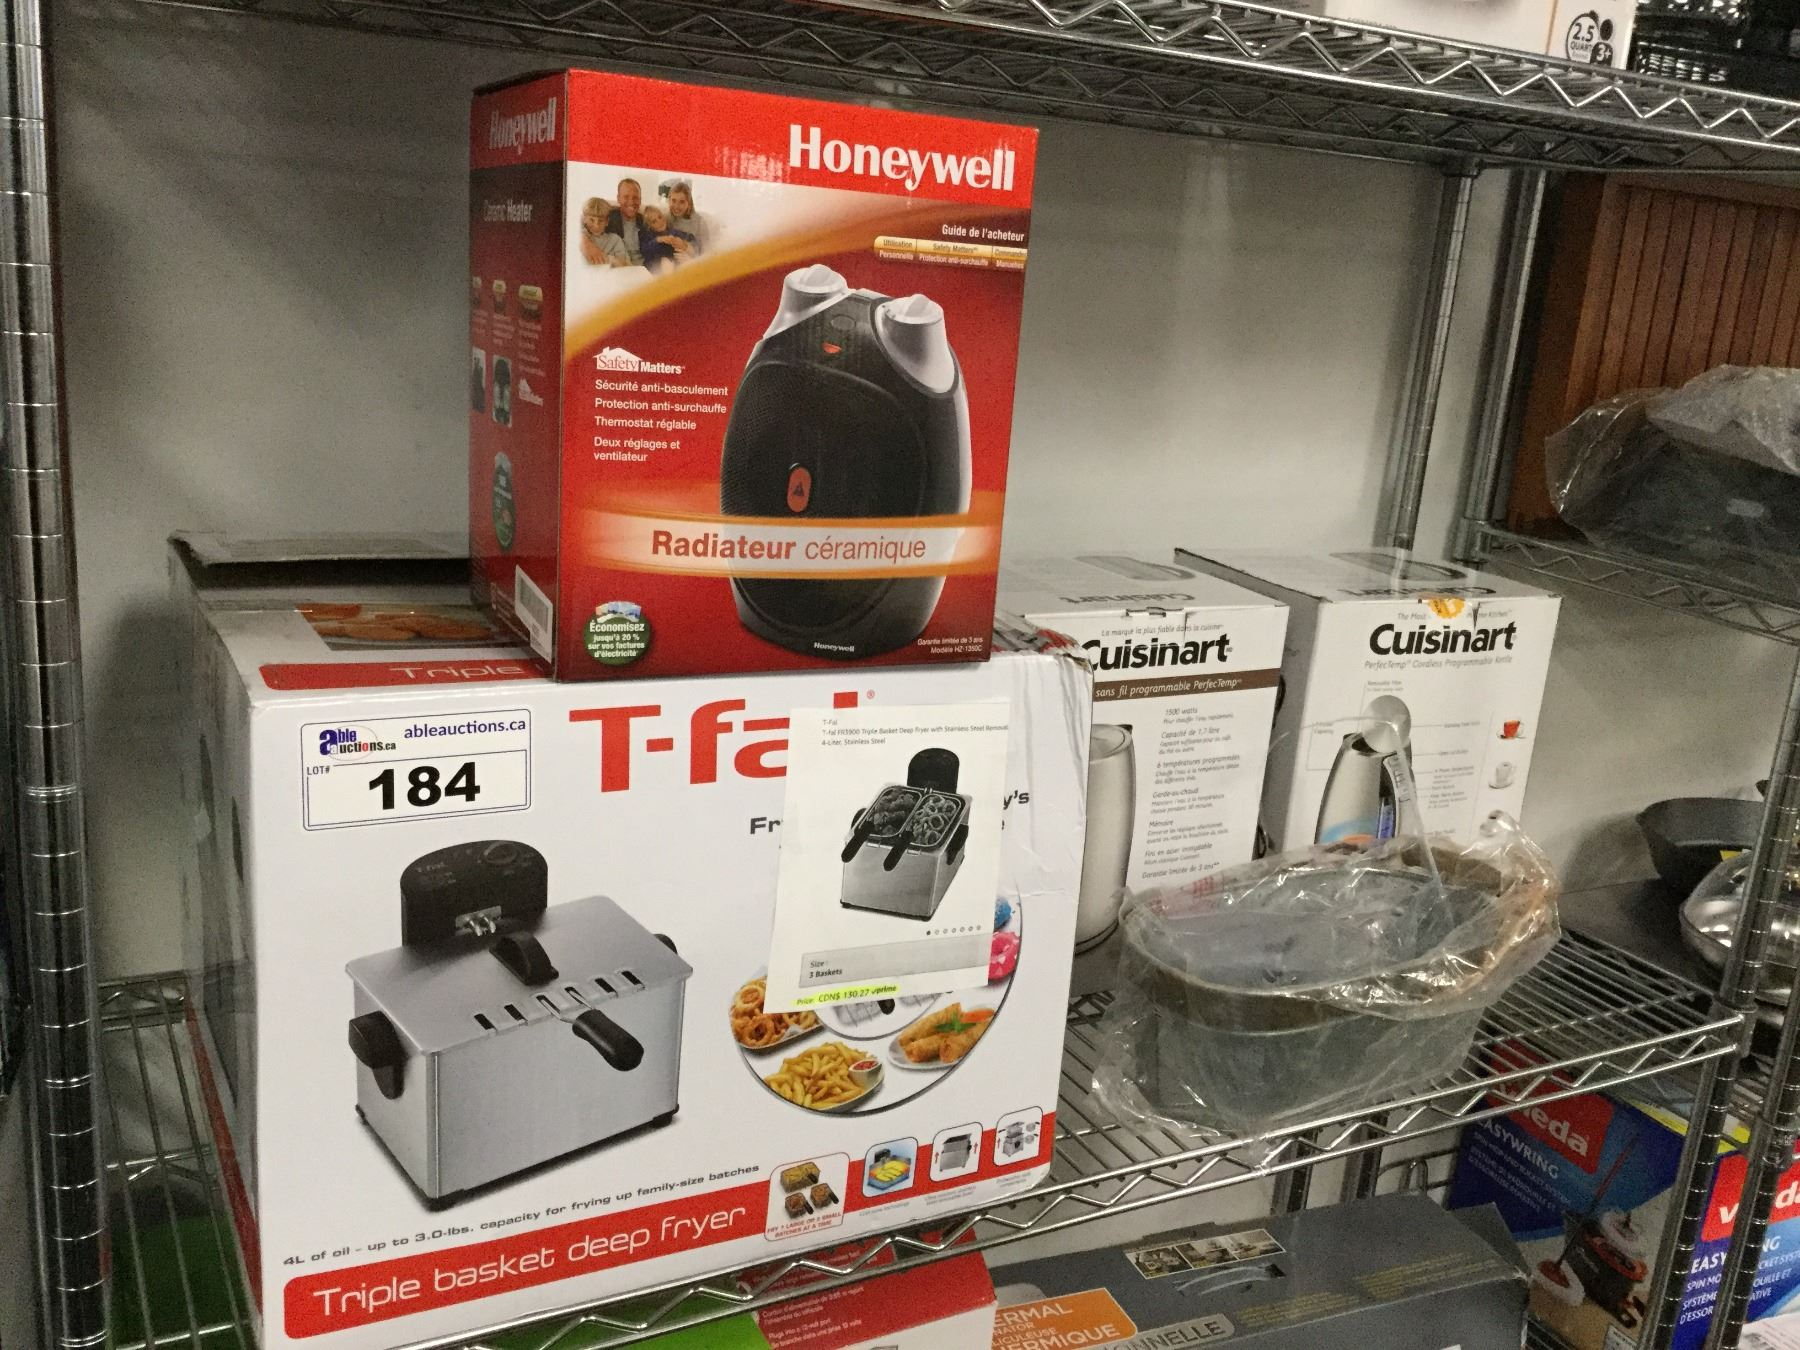 t-fal triple basket deep fryer, honeywell ceramic heater, cuisinart